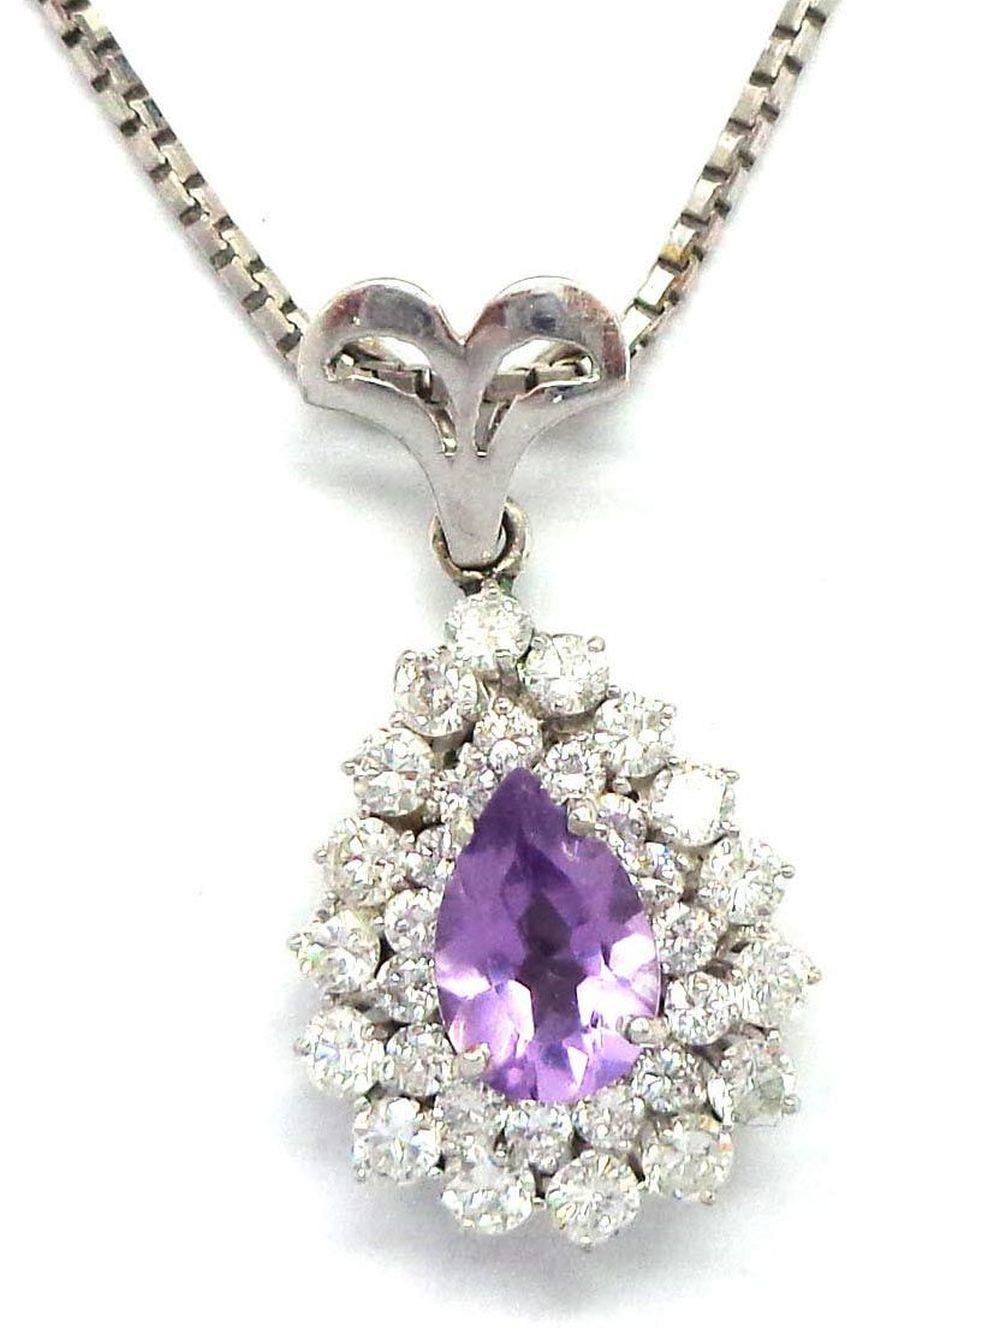 18 kt gold necklace/pendant